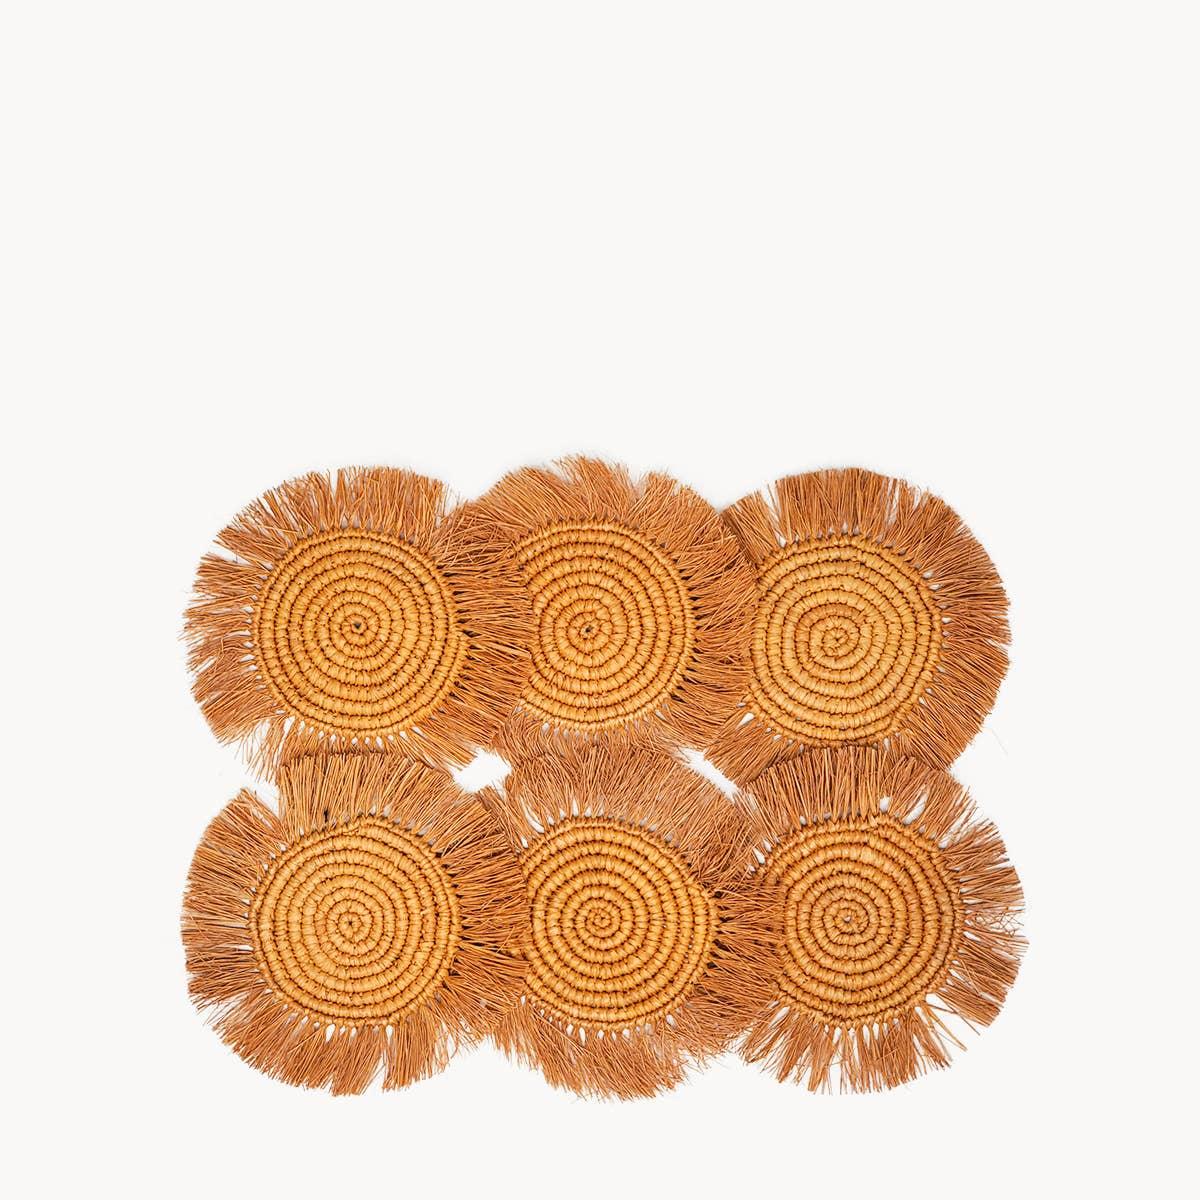 Flor Coaster - Marigold | Trada Marketplace